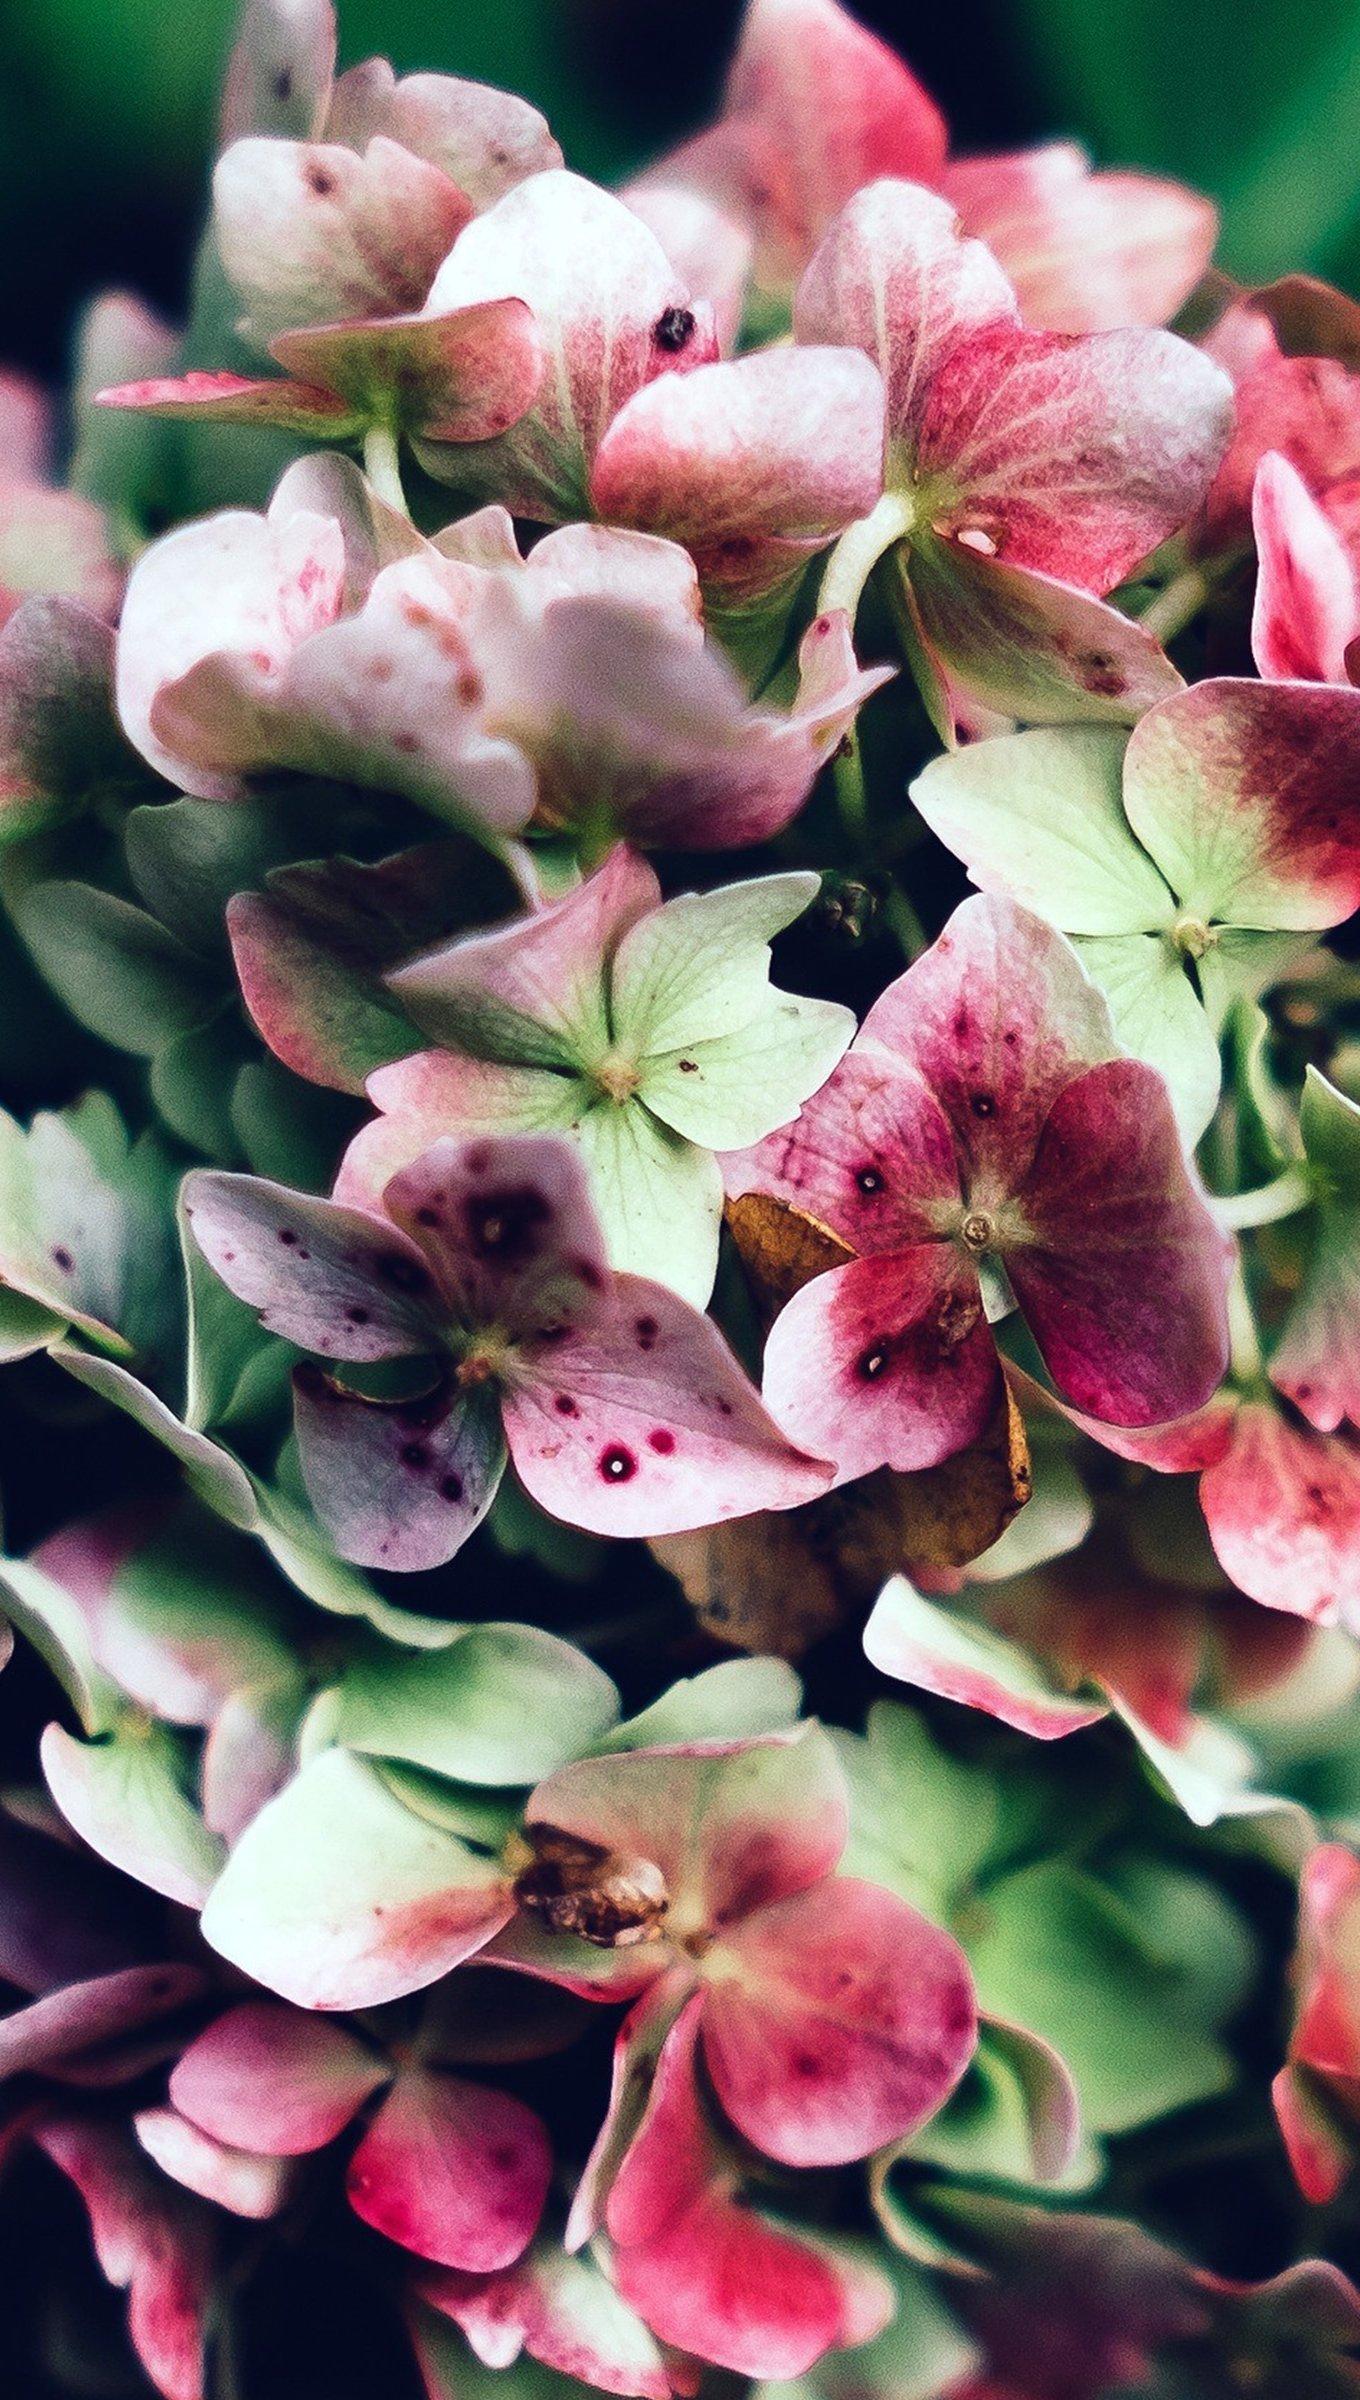 Fondos de pantalla Flores rosa Vertical